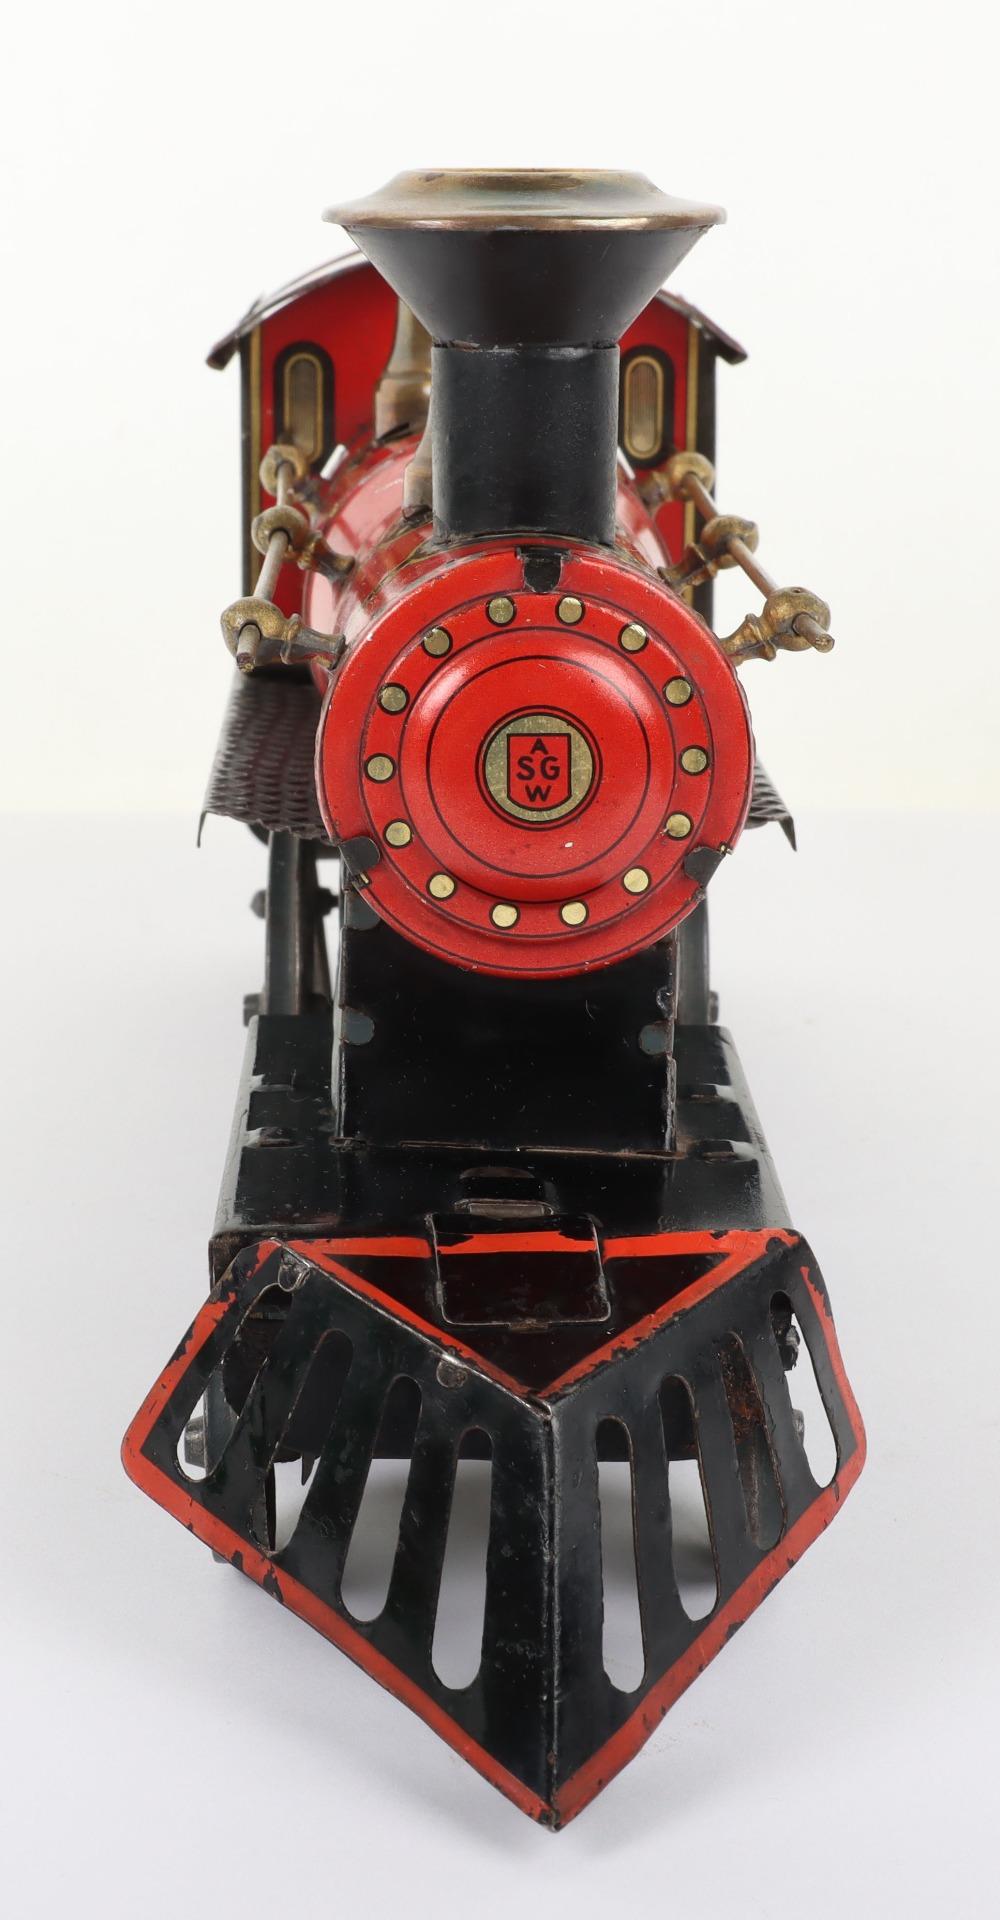 A Gunthermann tinplate 4-4-0 U.S outline floor train clockwork locomotive No.1273 and tender, German - Image 4 of 4